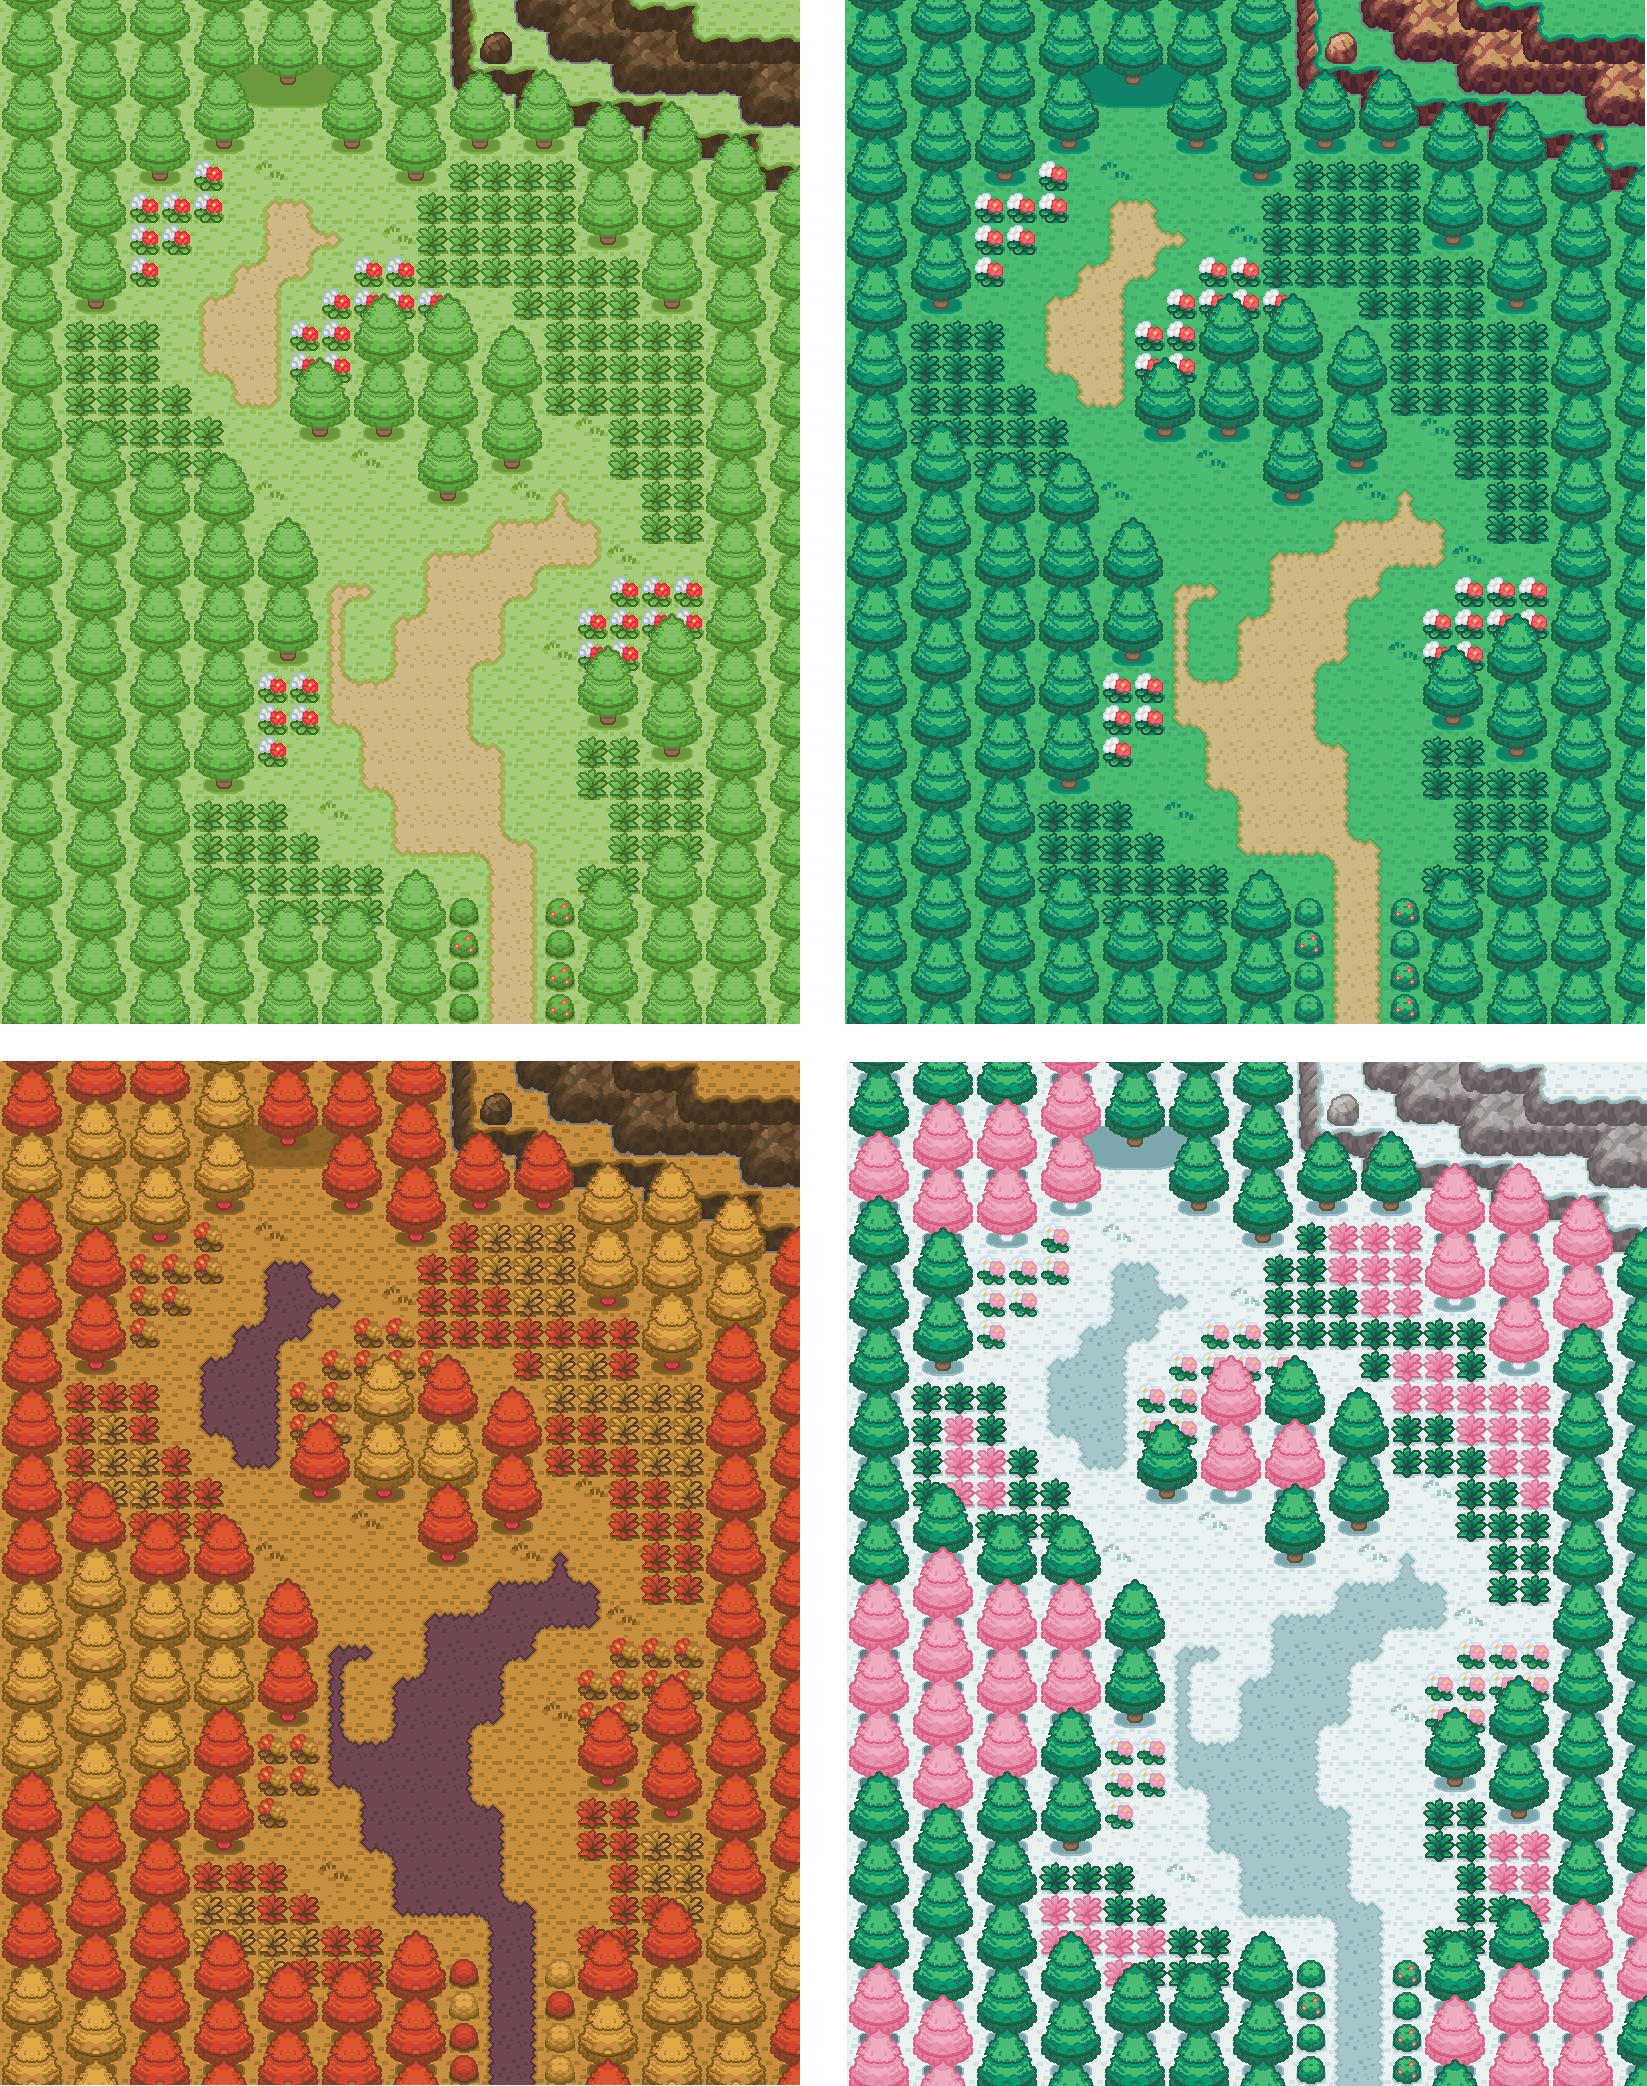 Best Tiles For The Kitchen Floor